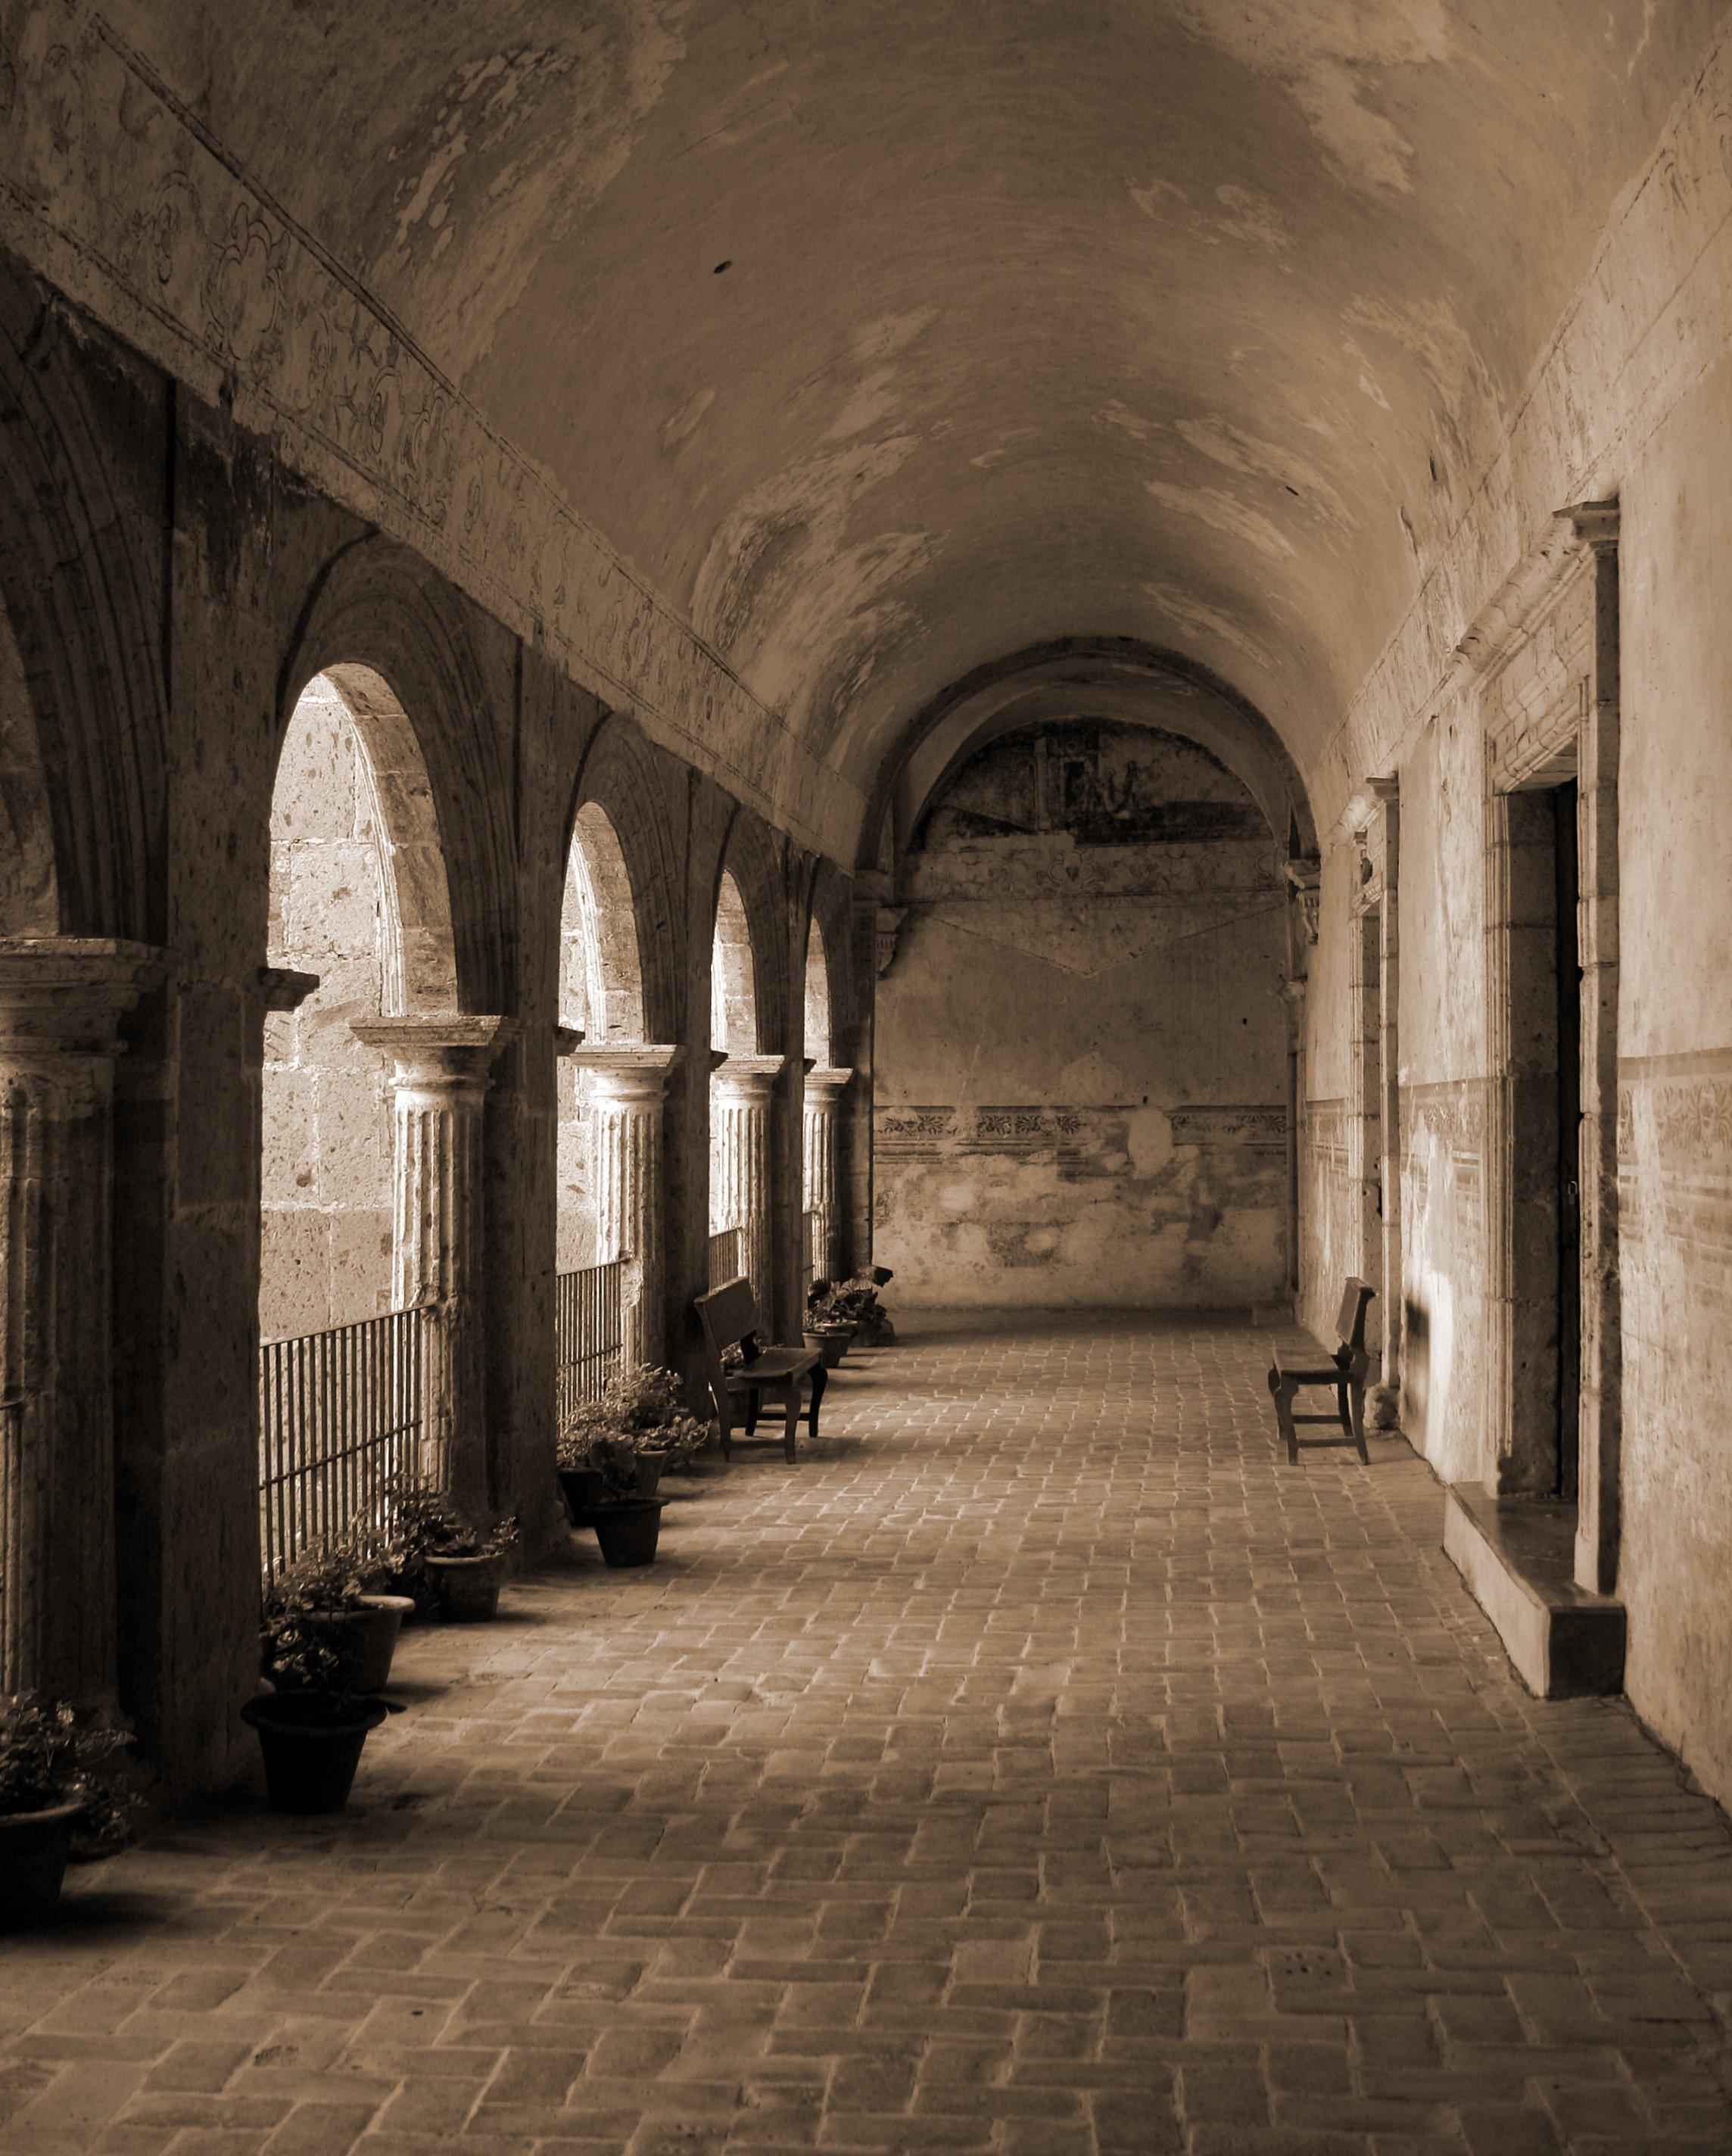 FileInterior Convento 3jpg Wikimedia Commons